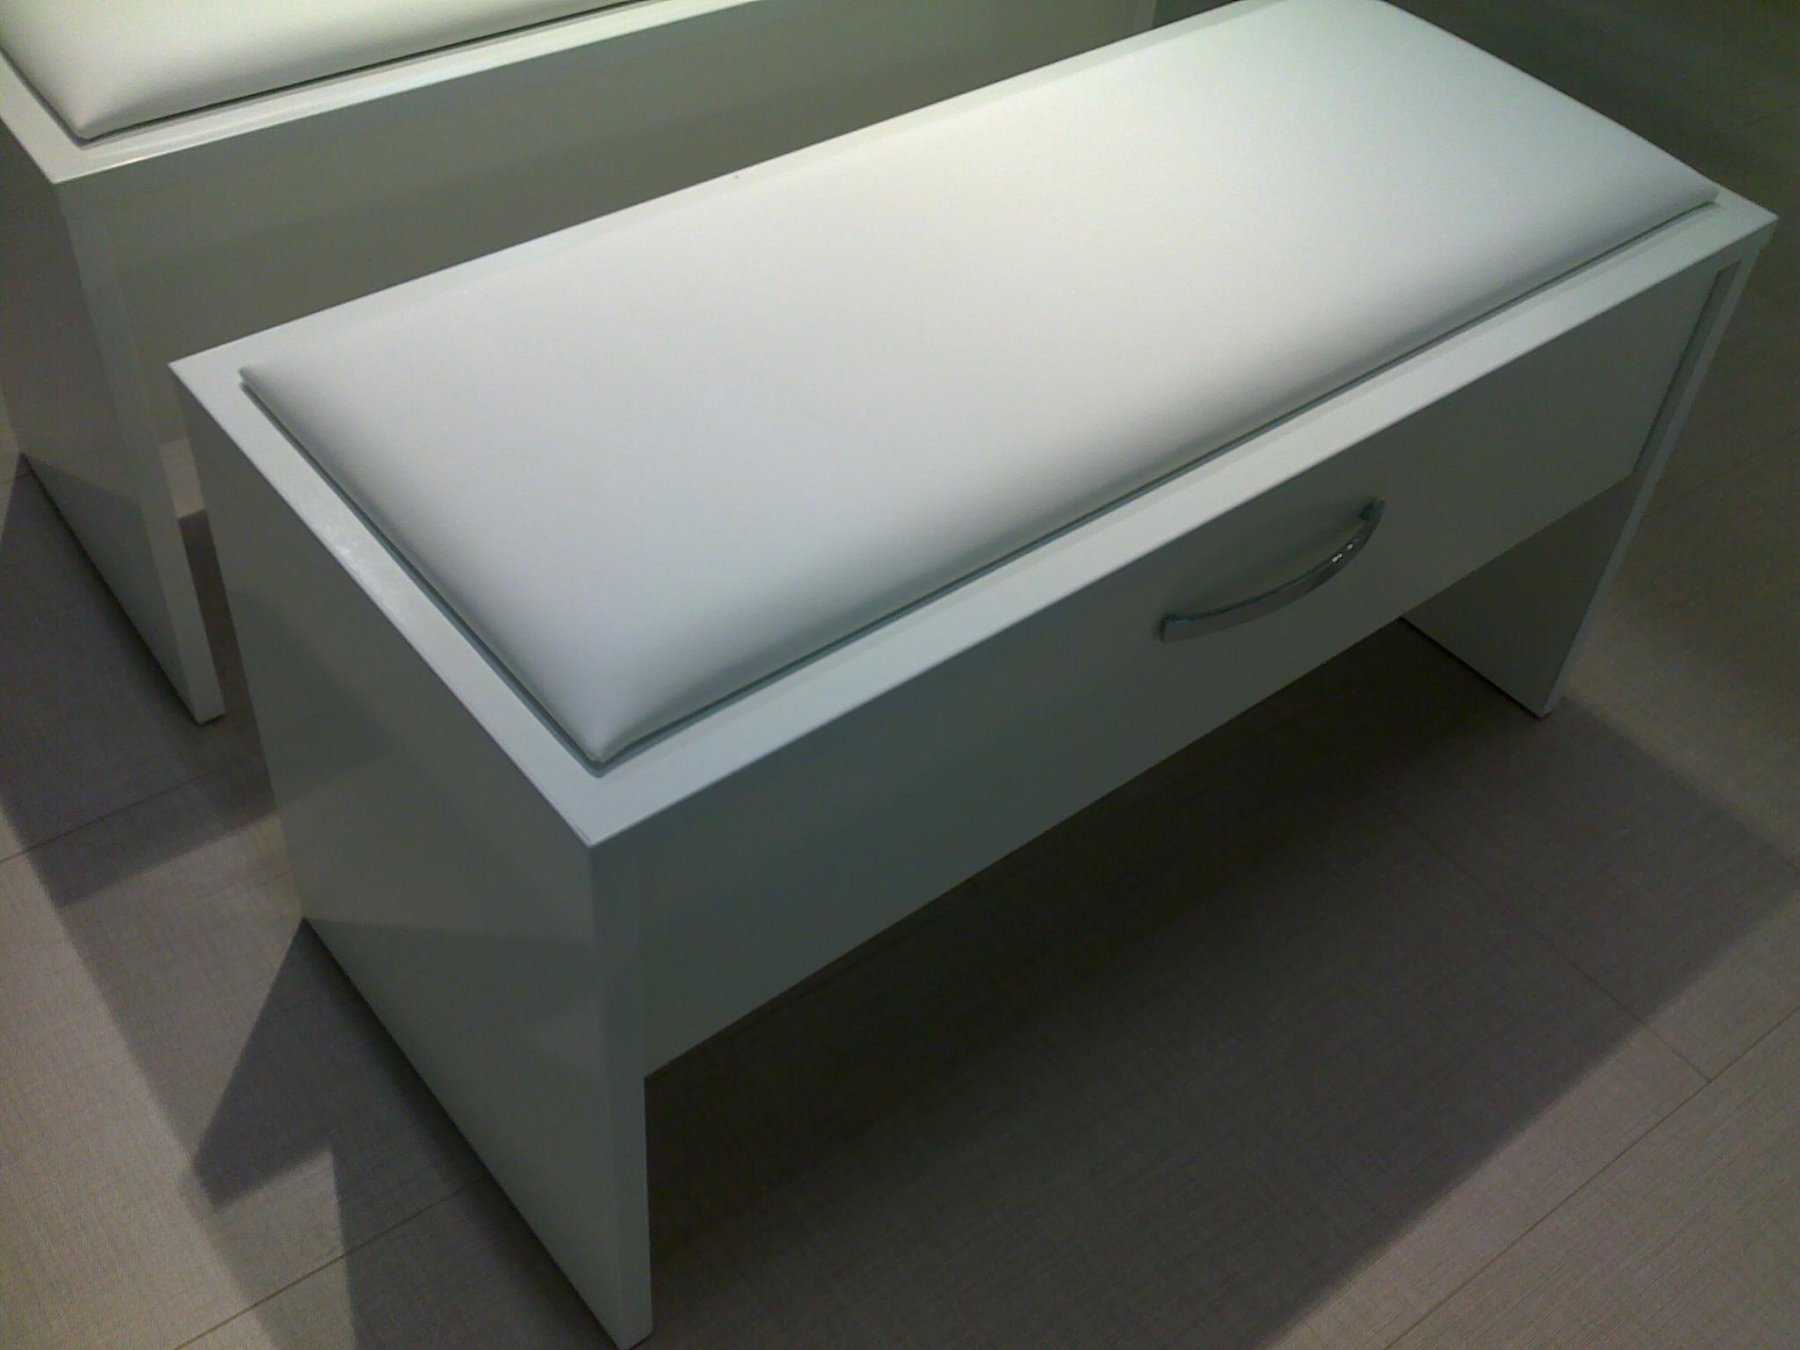 Solitaire 6005 Sitzbank Badschrank Gunstig